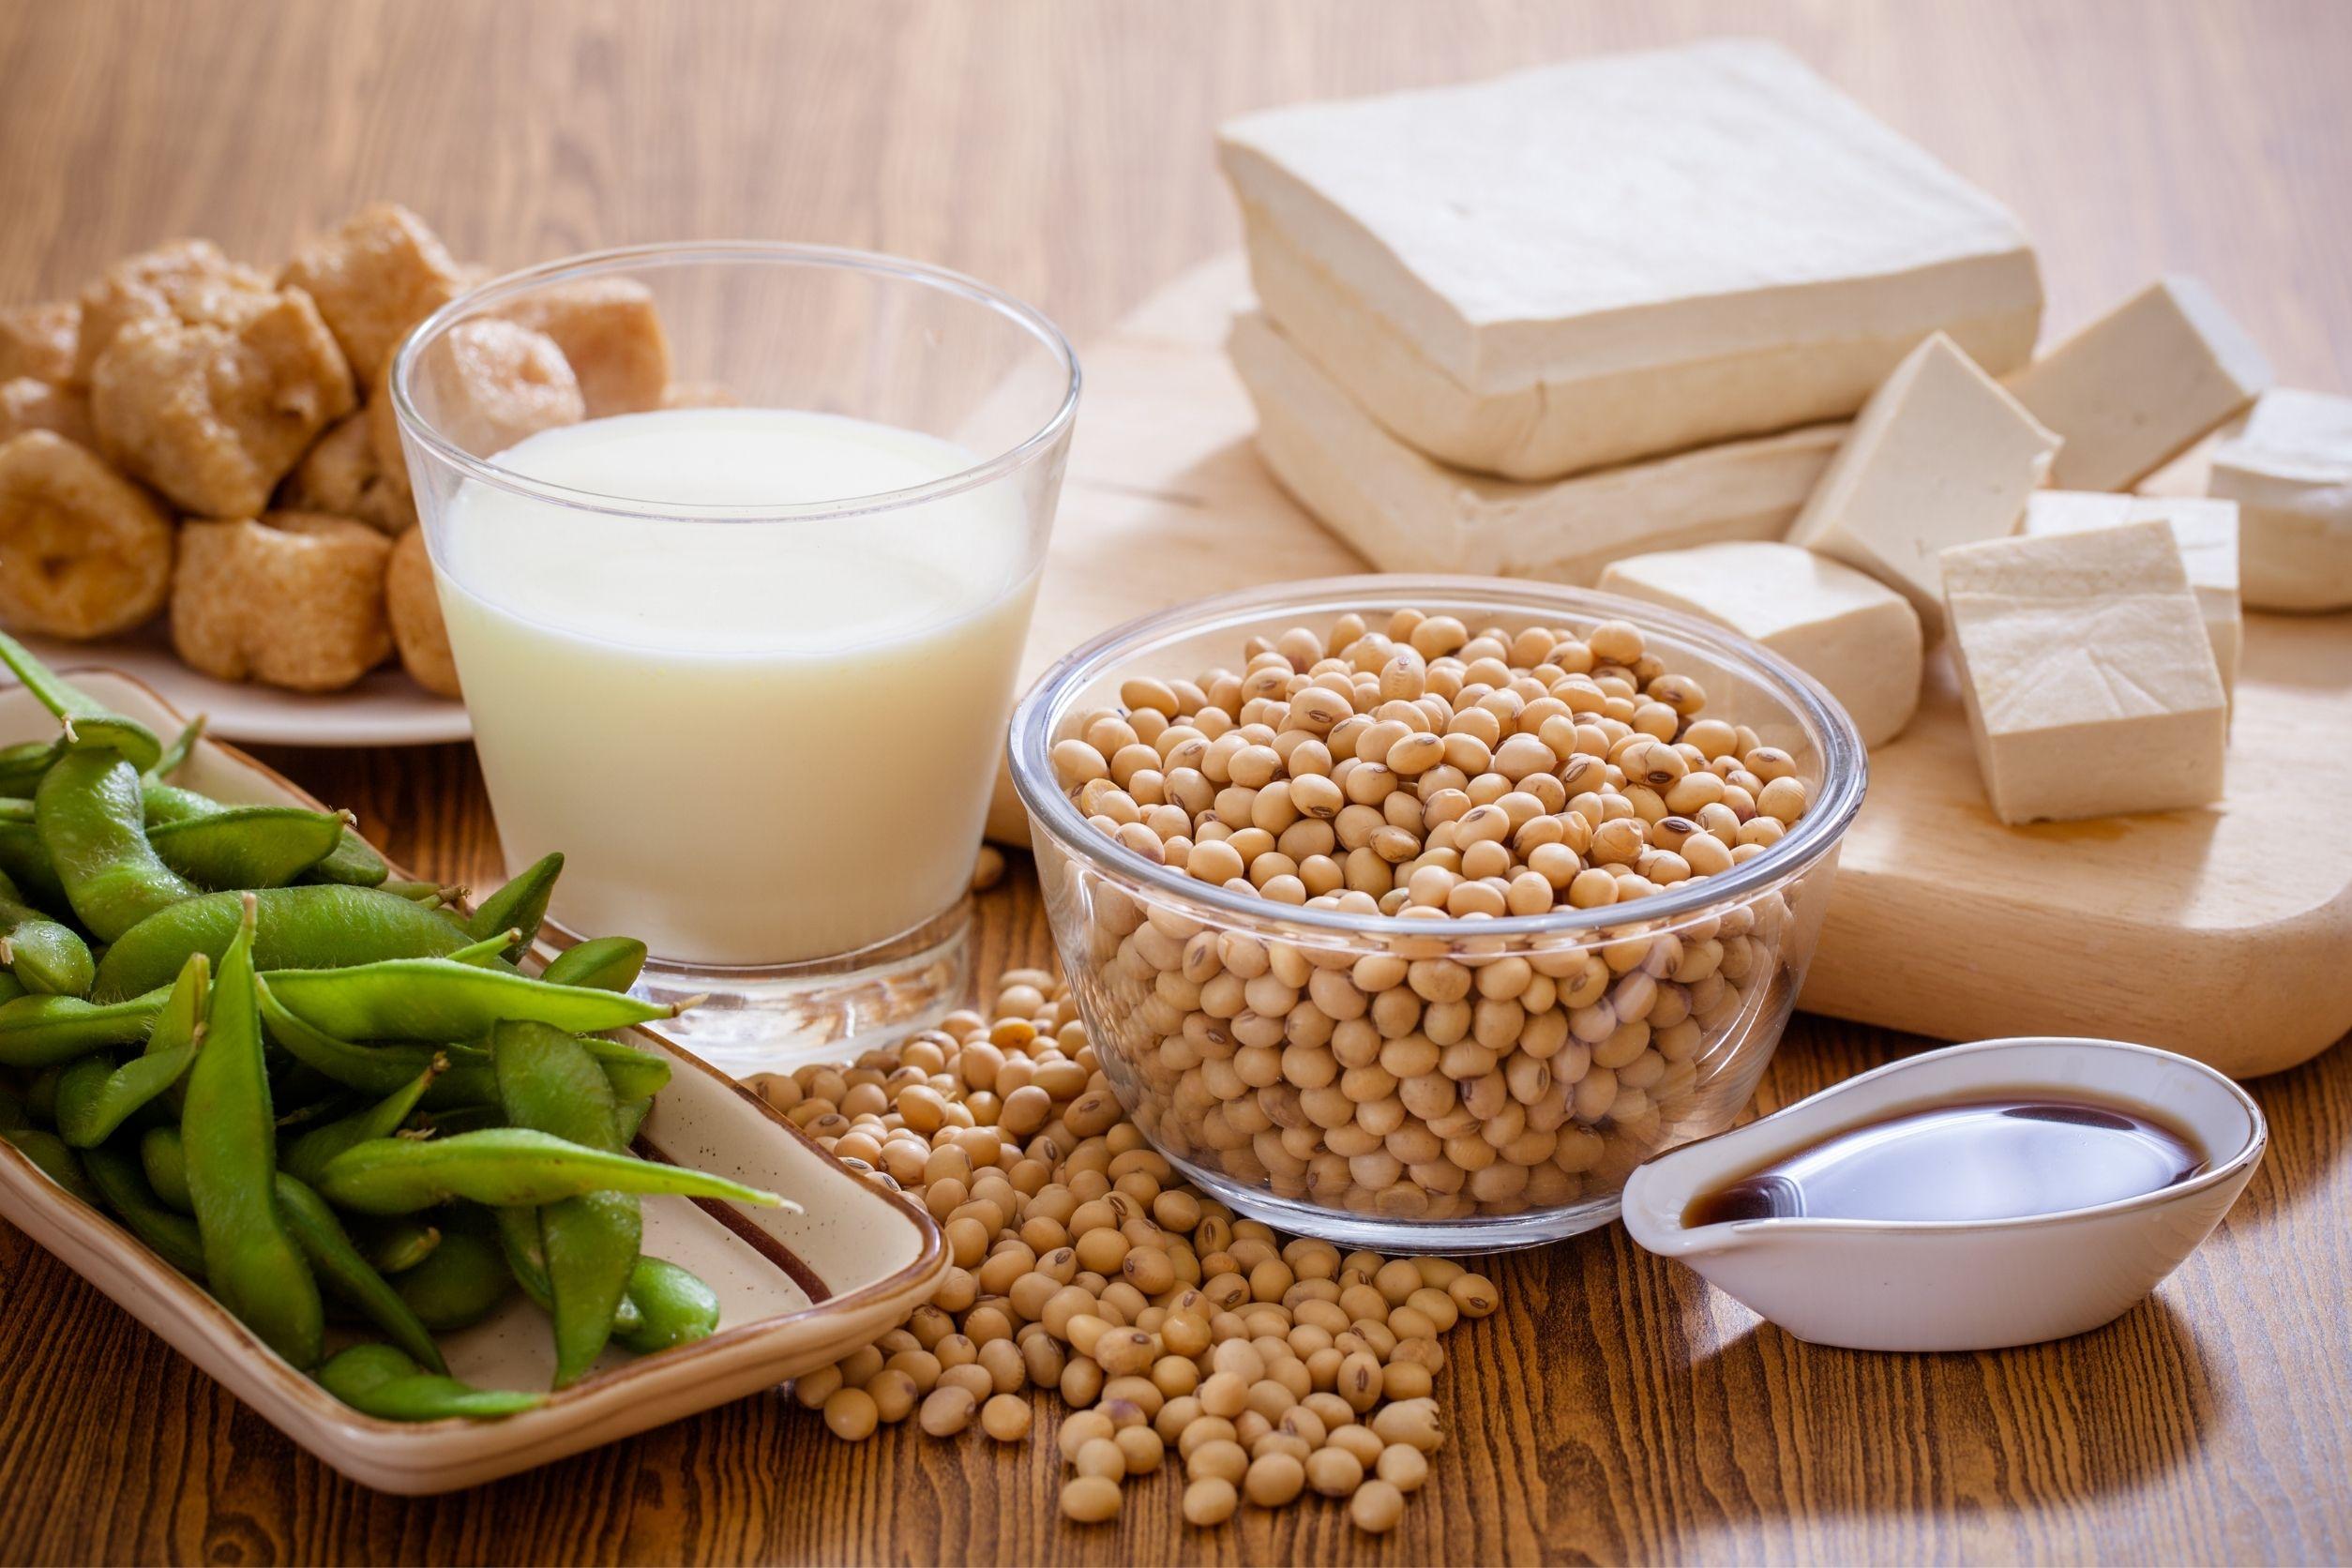 vegetarian foods made of soy